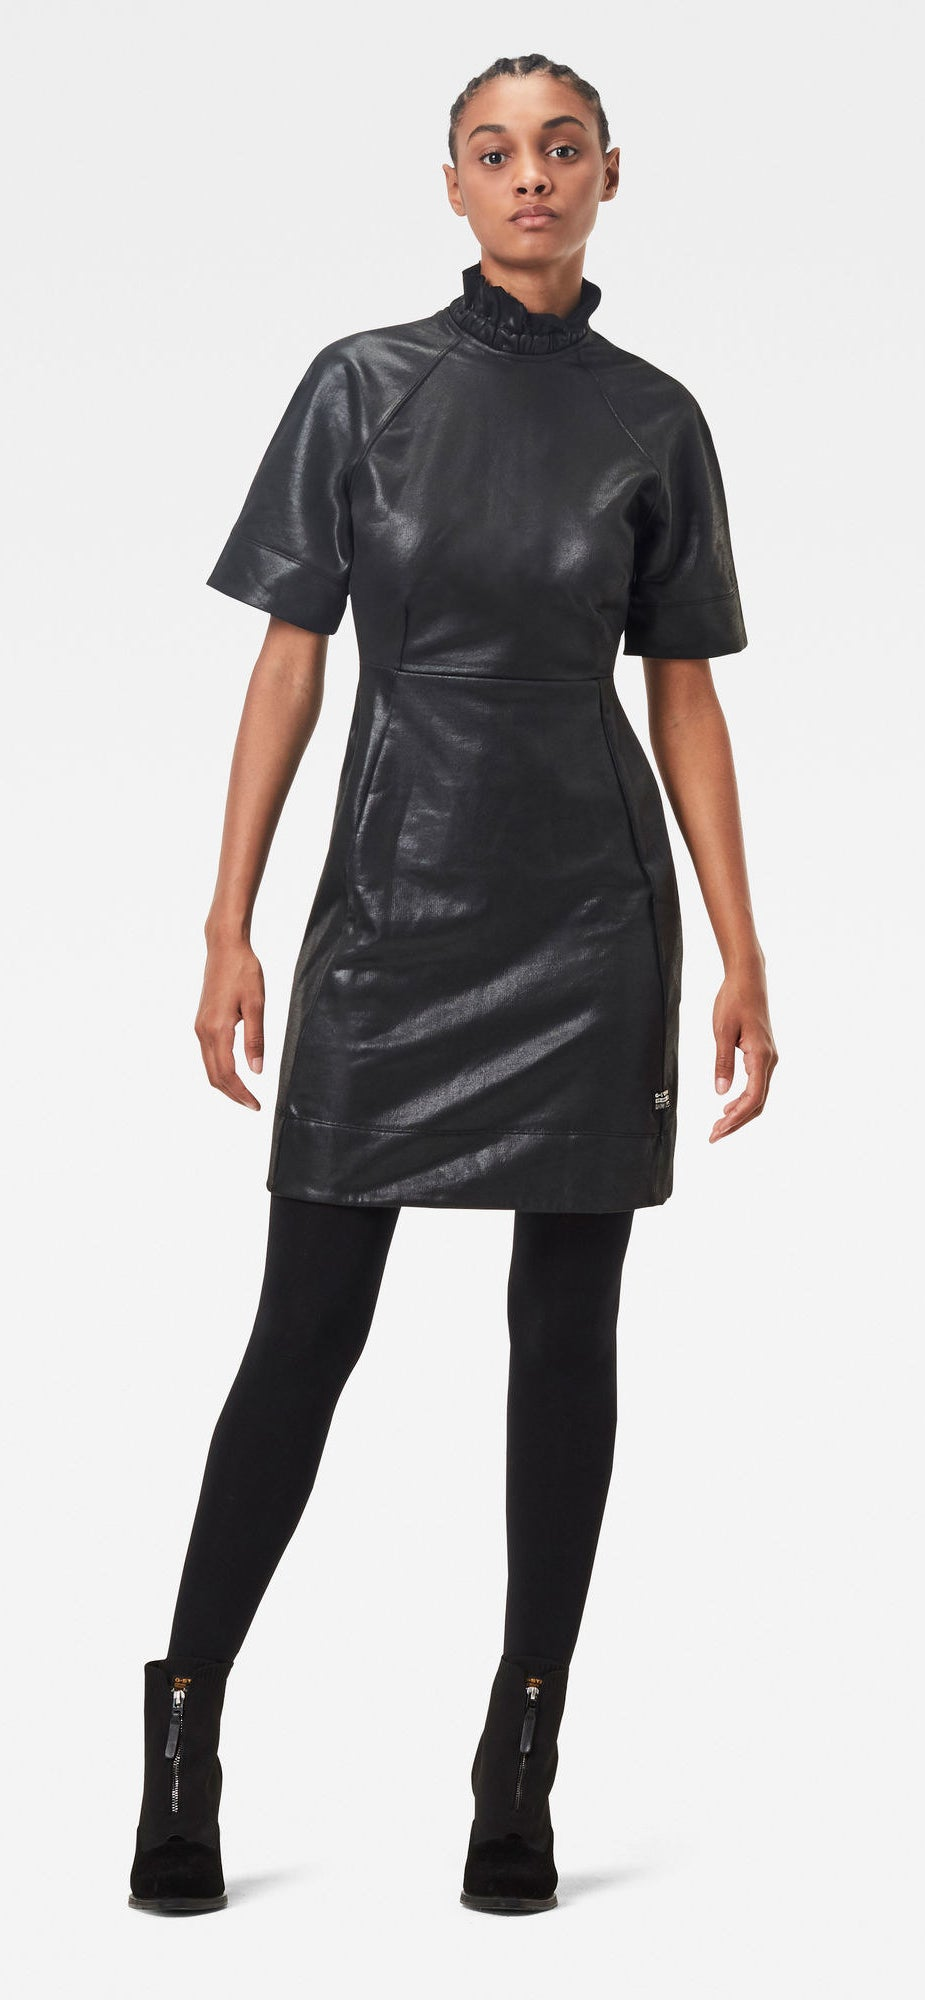 A model wears the glossy black dress